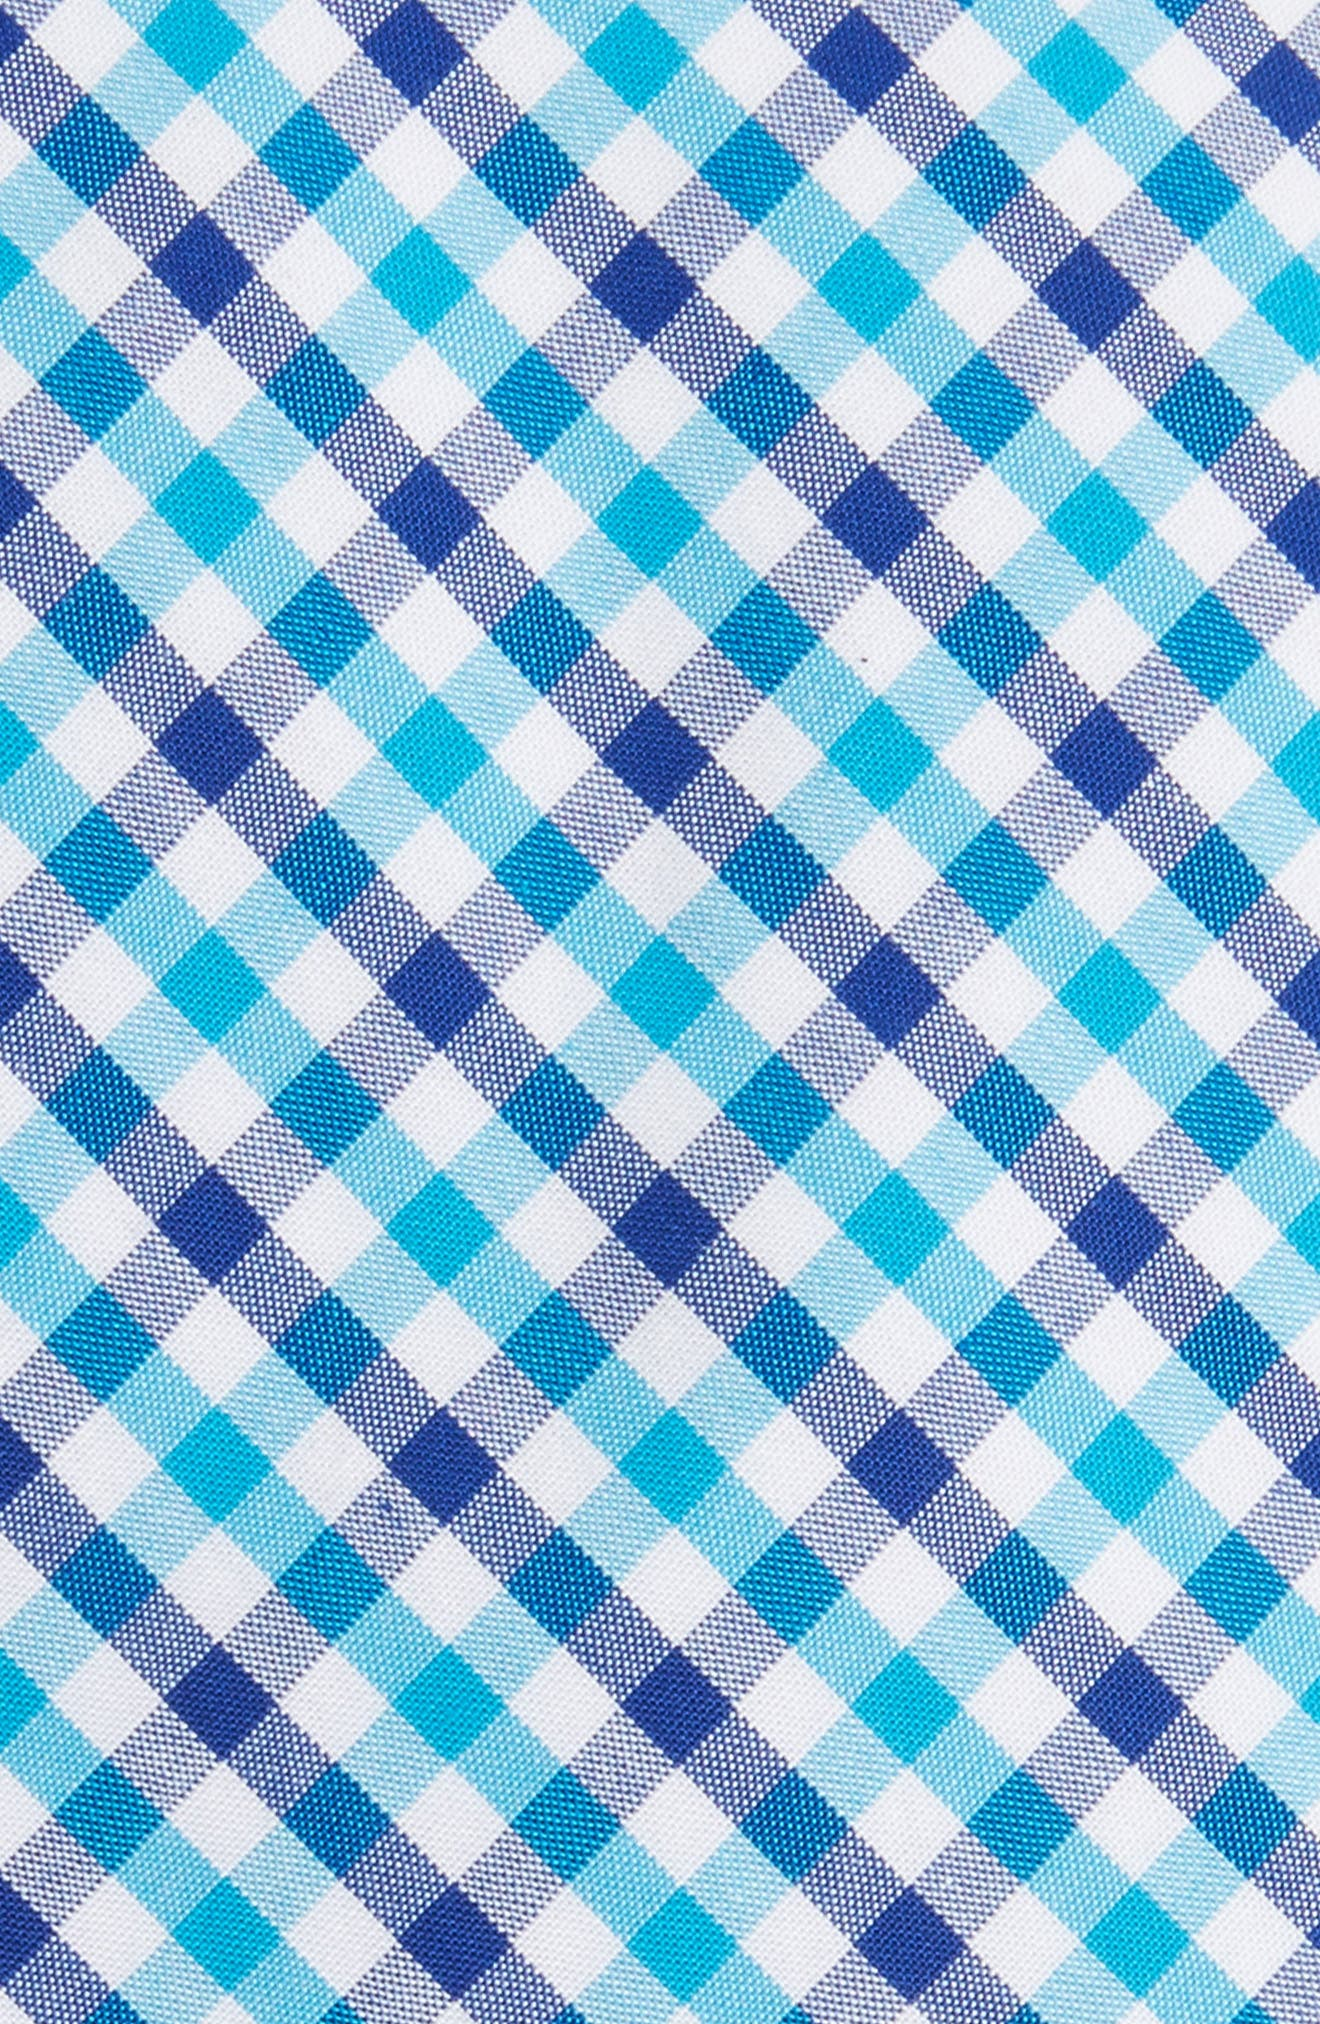 Robin Diamond Check Skinny Tie,                             Alternate thumbnail 7, color,